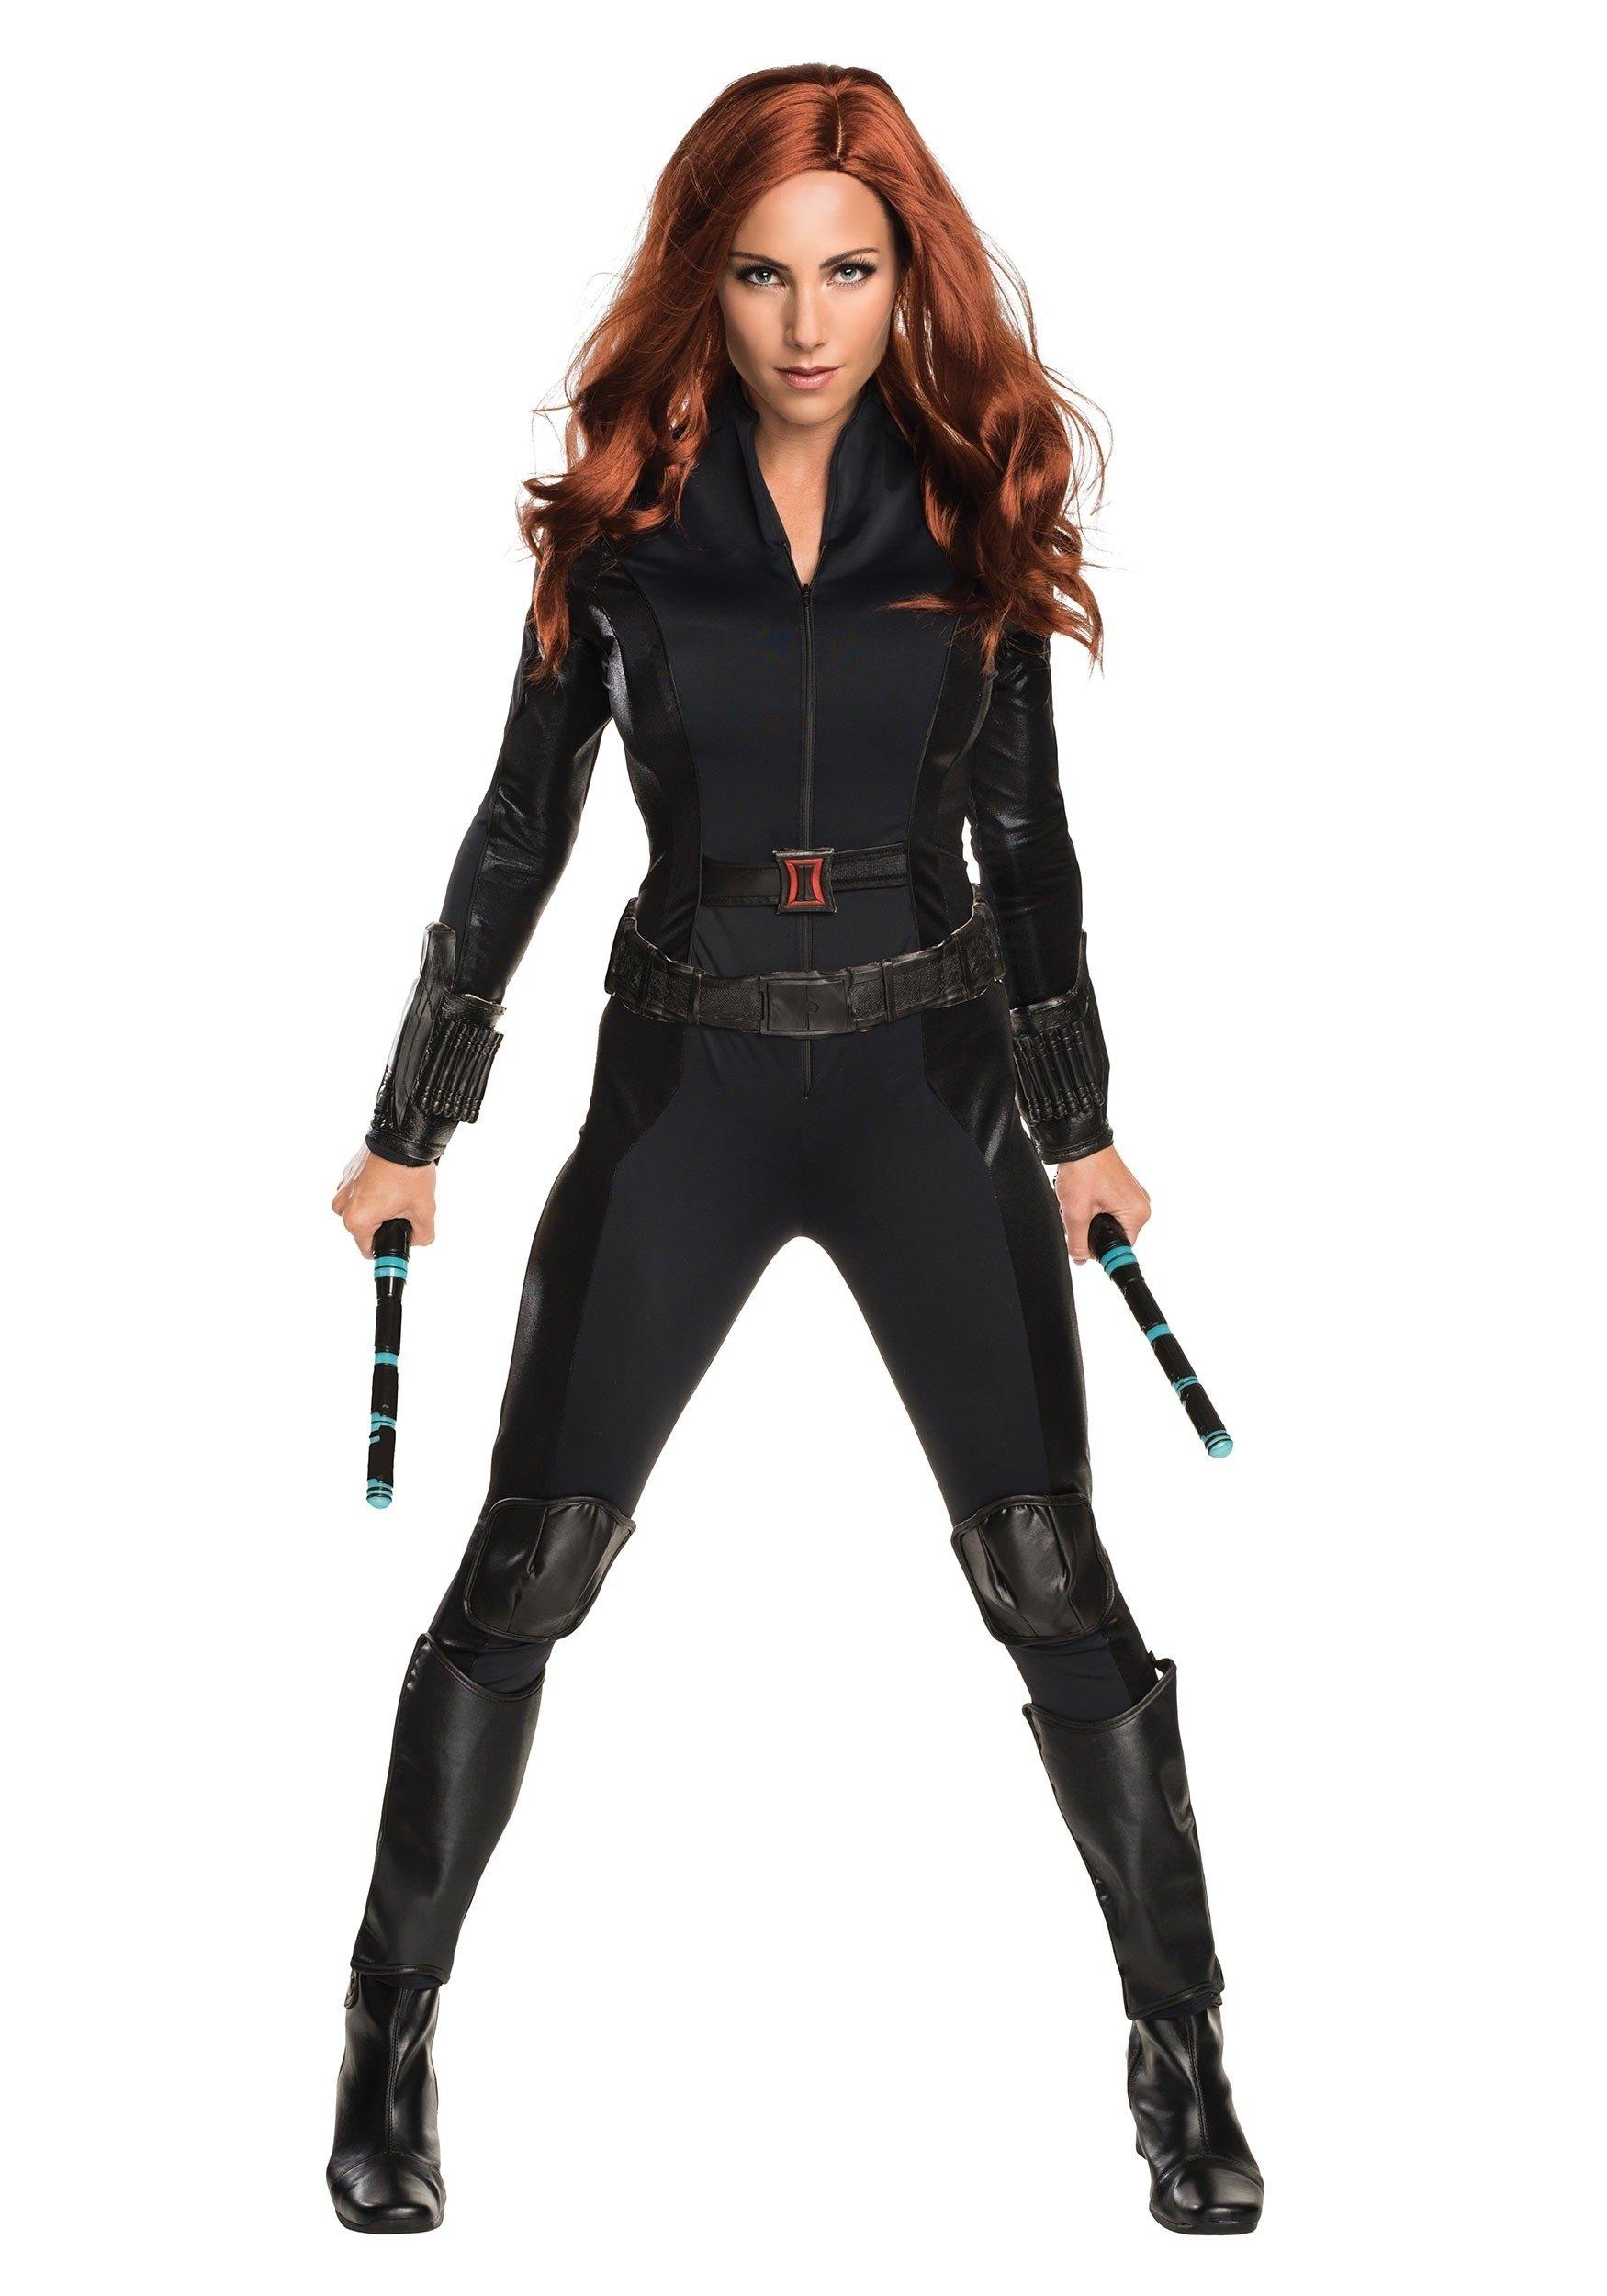 10 Stylish Superhero Costume Ideas For Women womens superhero costumes for halloween halloweencostumes 2020